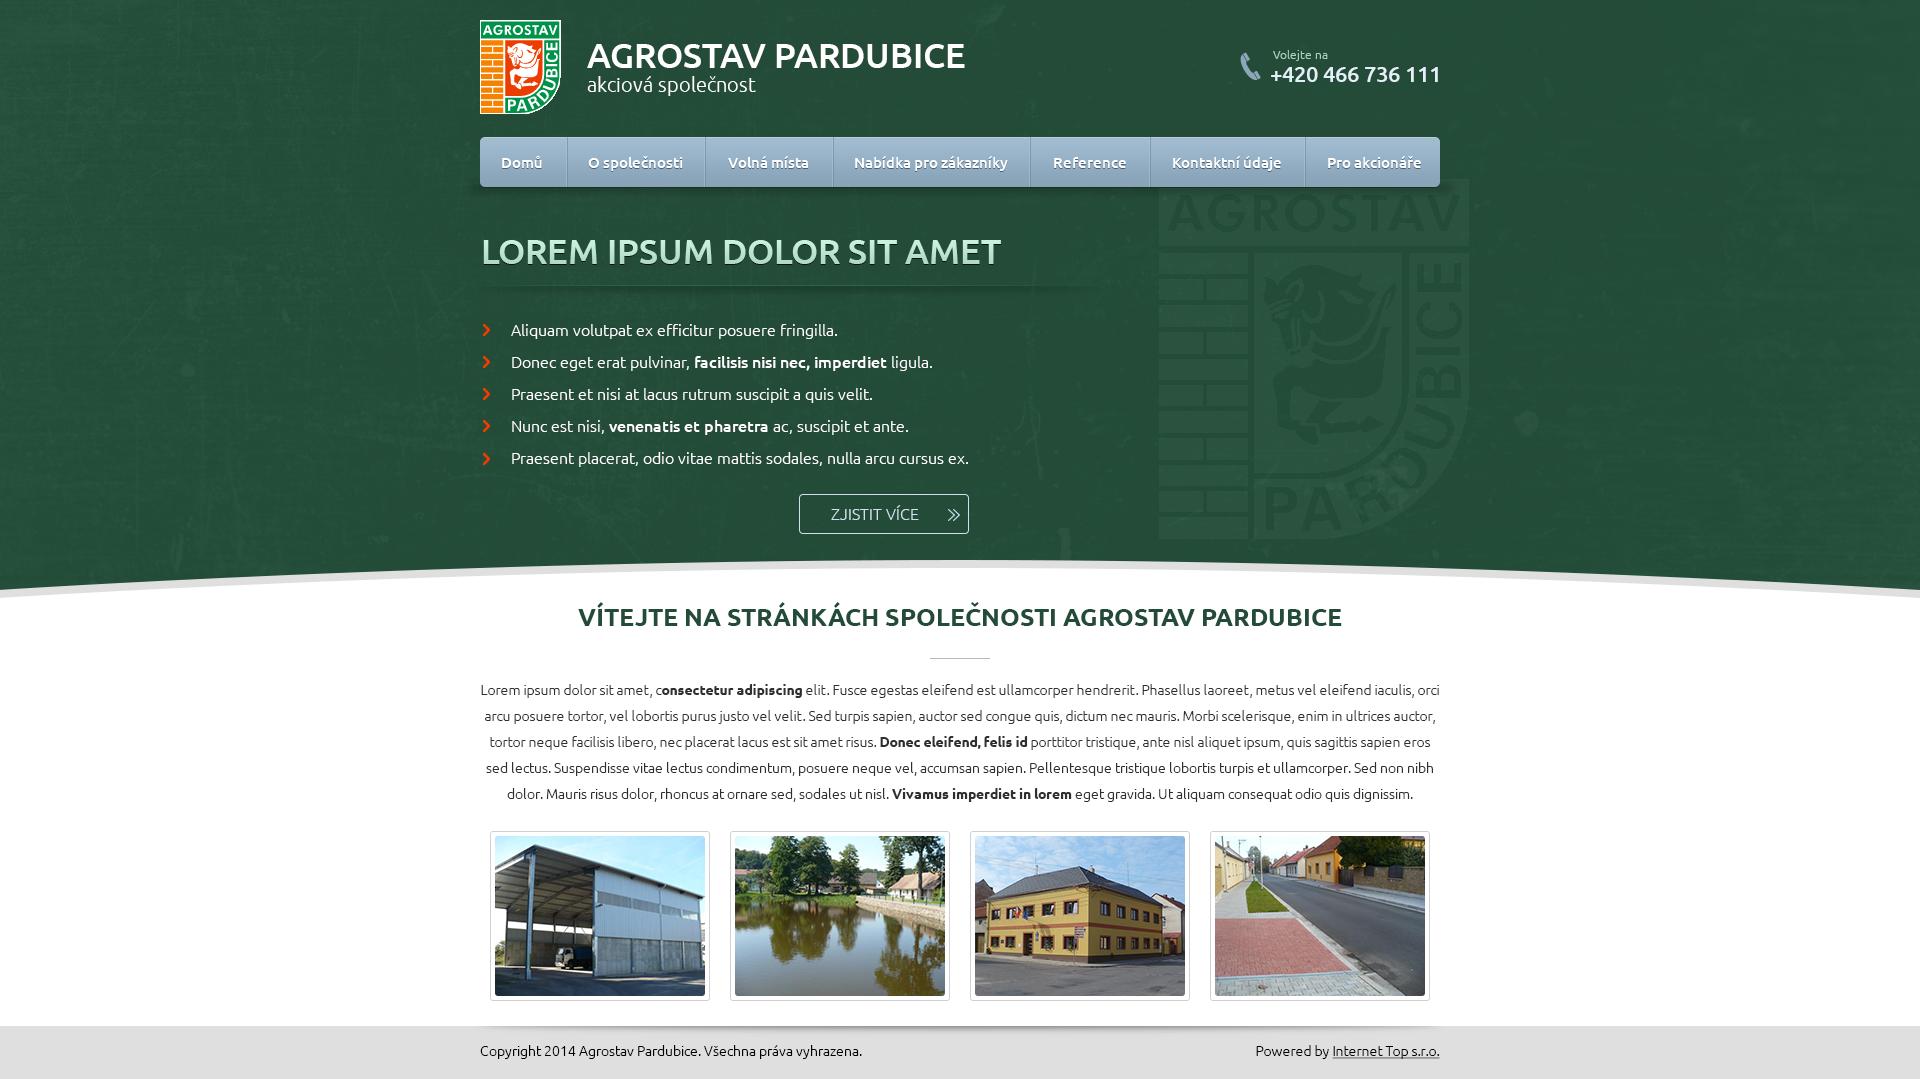 Agrostav Pardubice